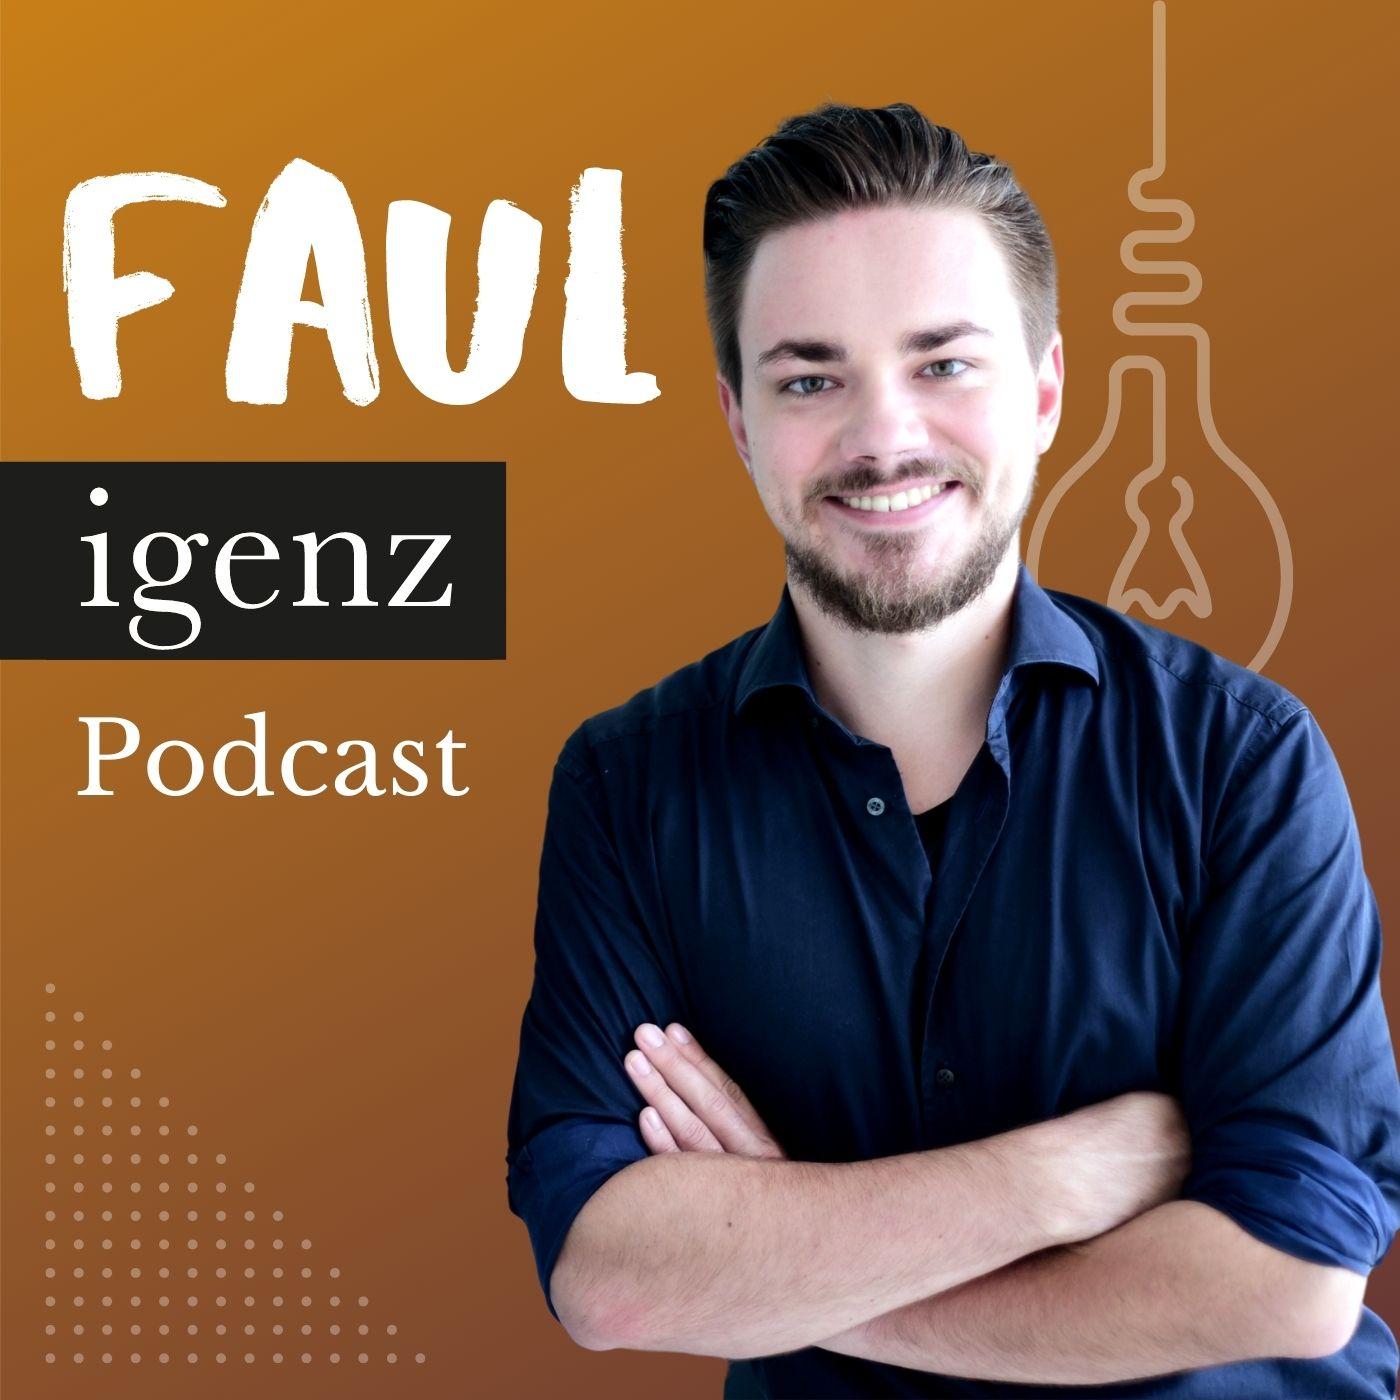 fauligenz Podcast